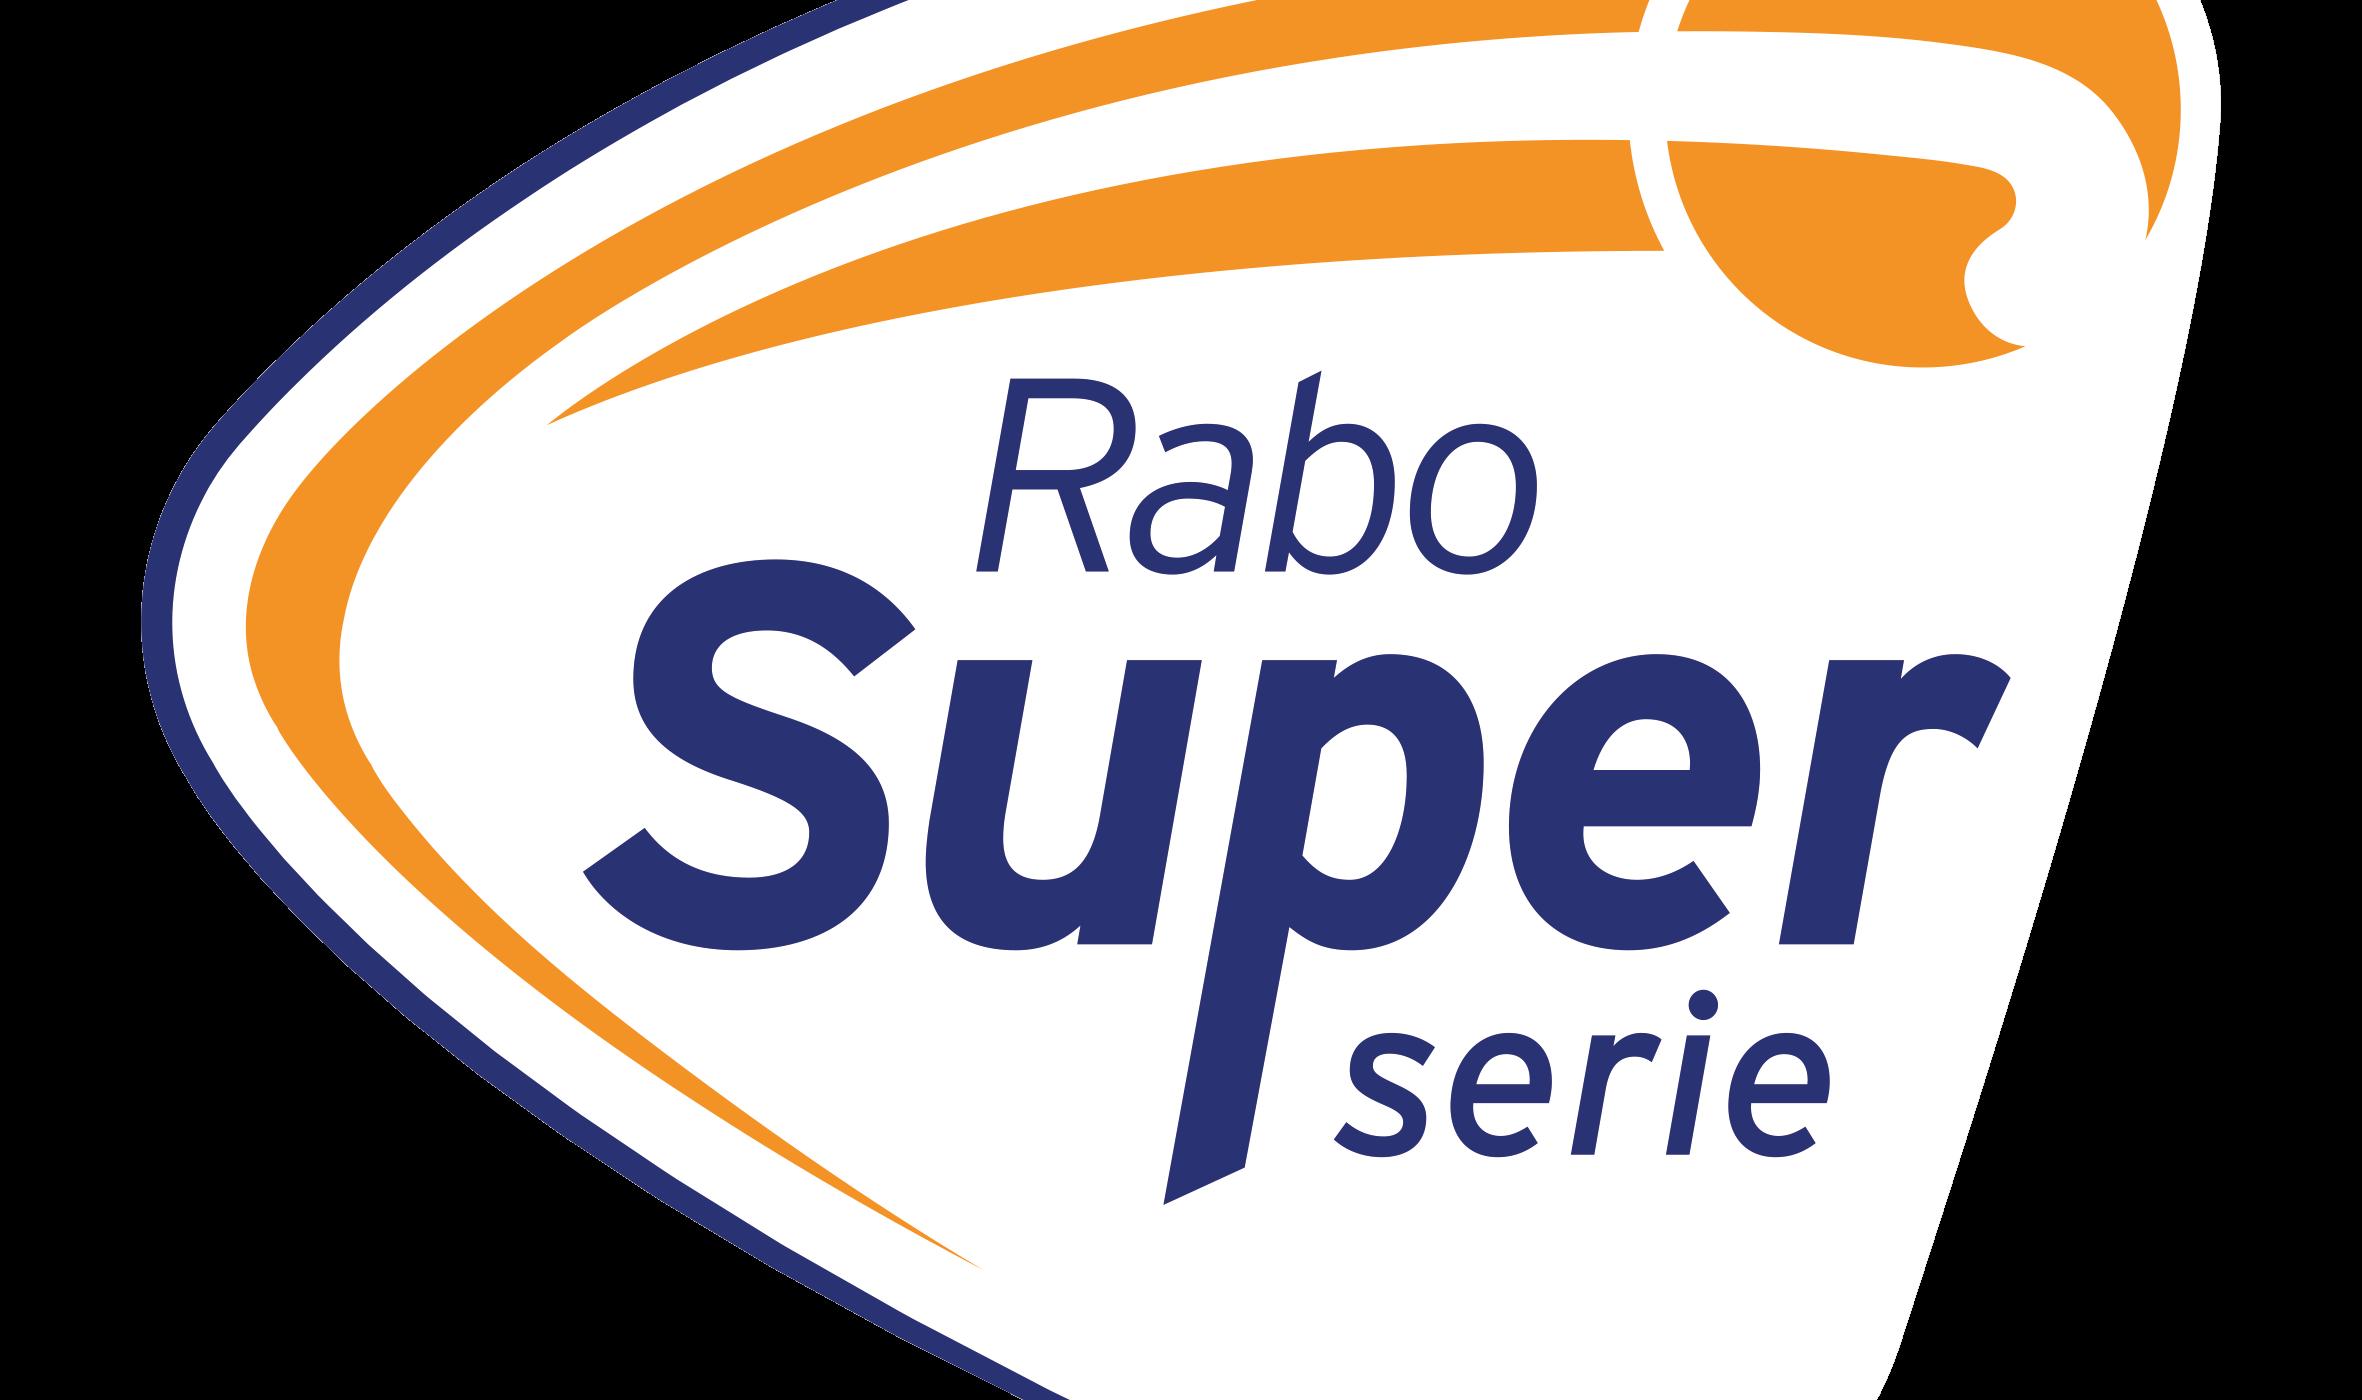 Alkmaarsche M.H.C. & G.H.C. Rapid hosten Rabo Super Serie 2018